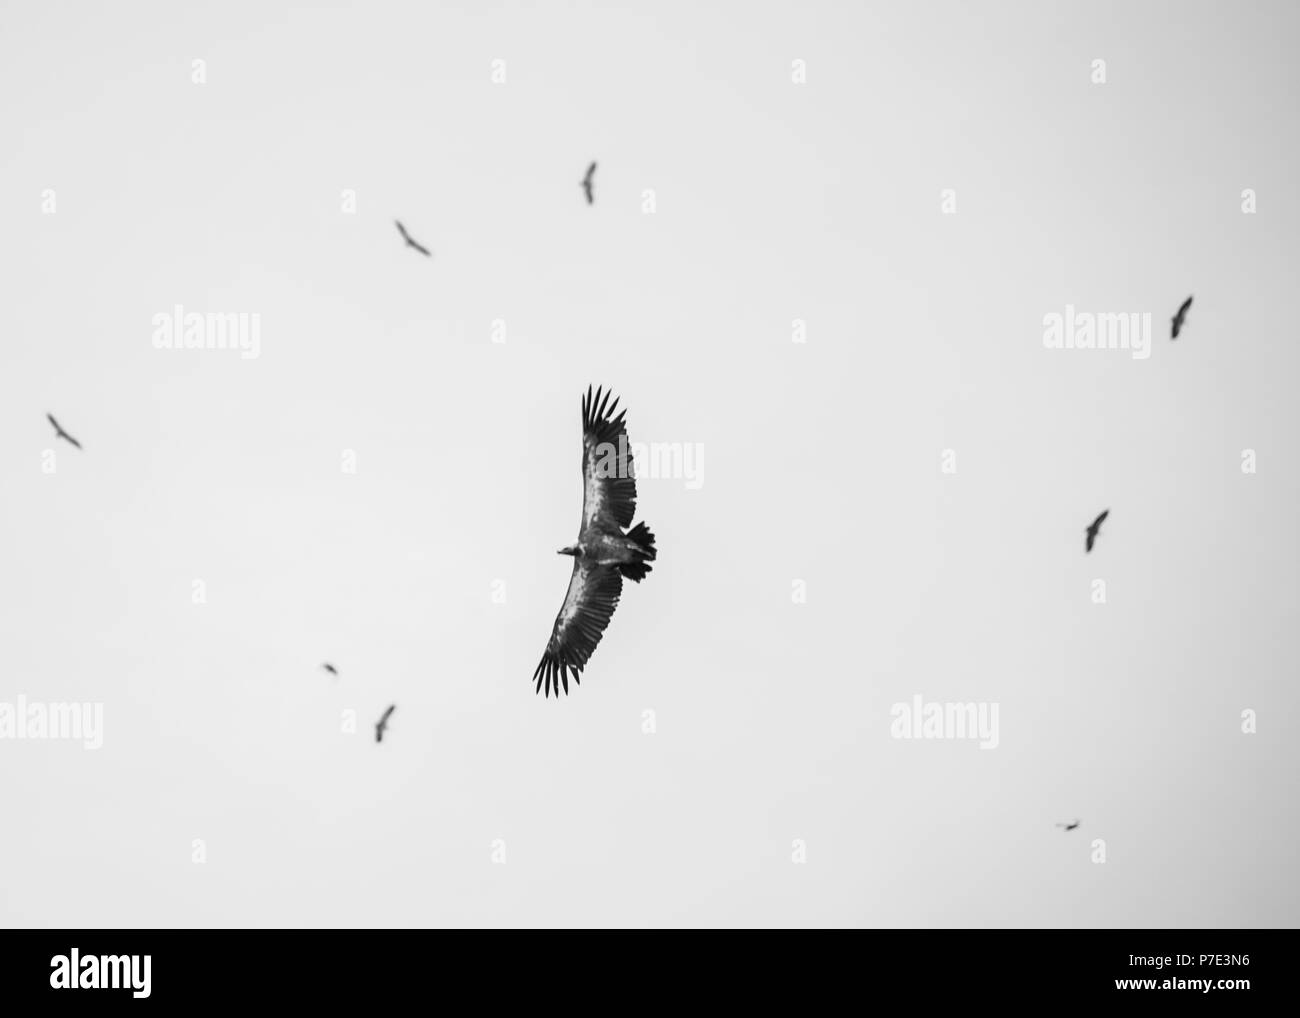 Bird in flight, low angle view, Chobe National Park, Botswana - Stock Image